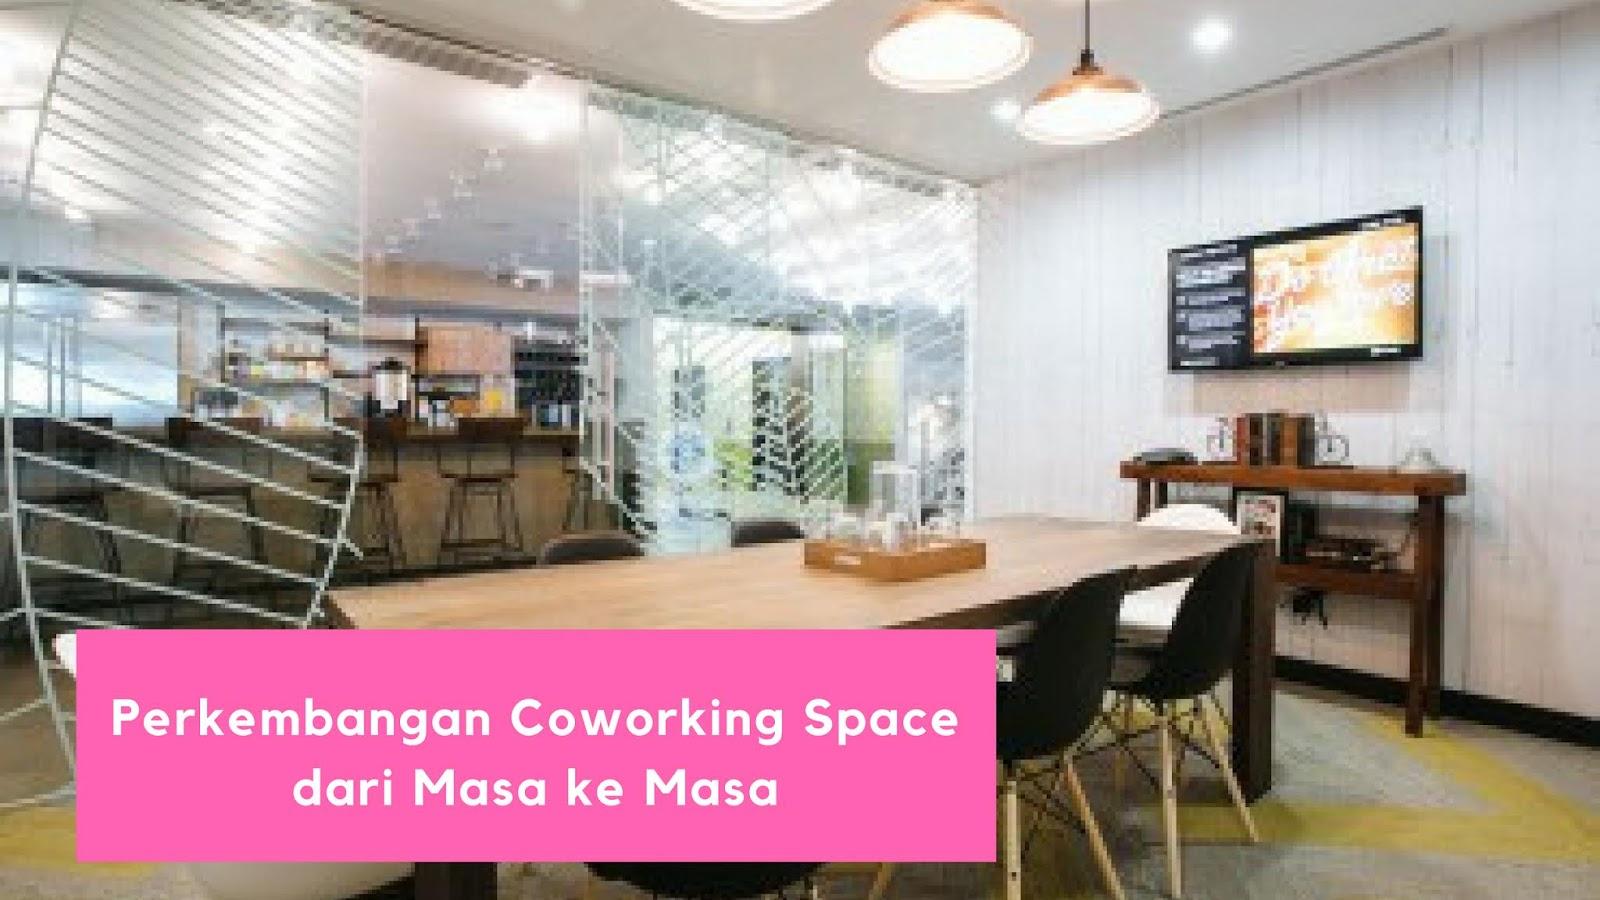 Perkembangan Coworking Space dari Masa ke Masa